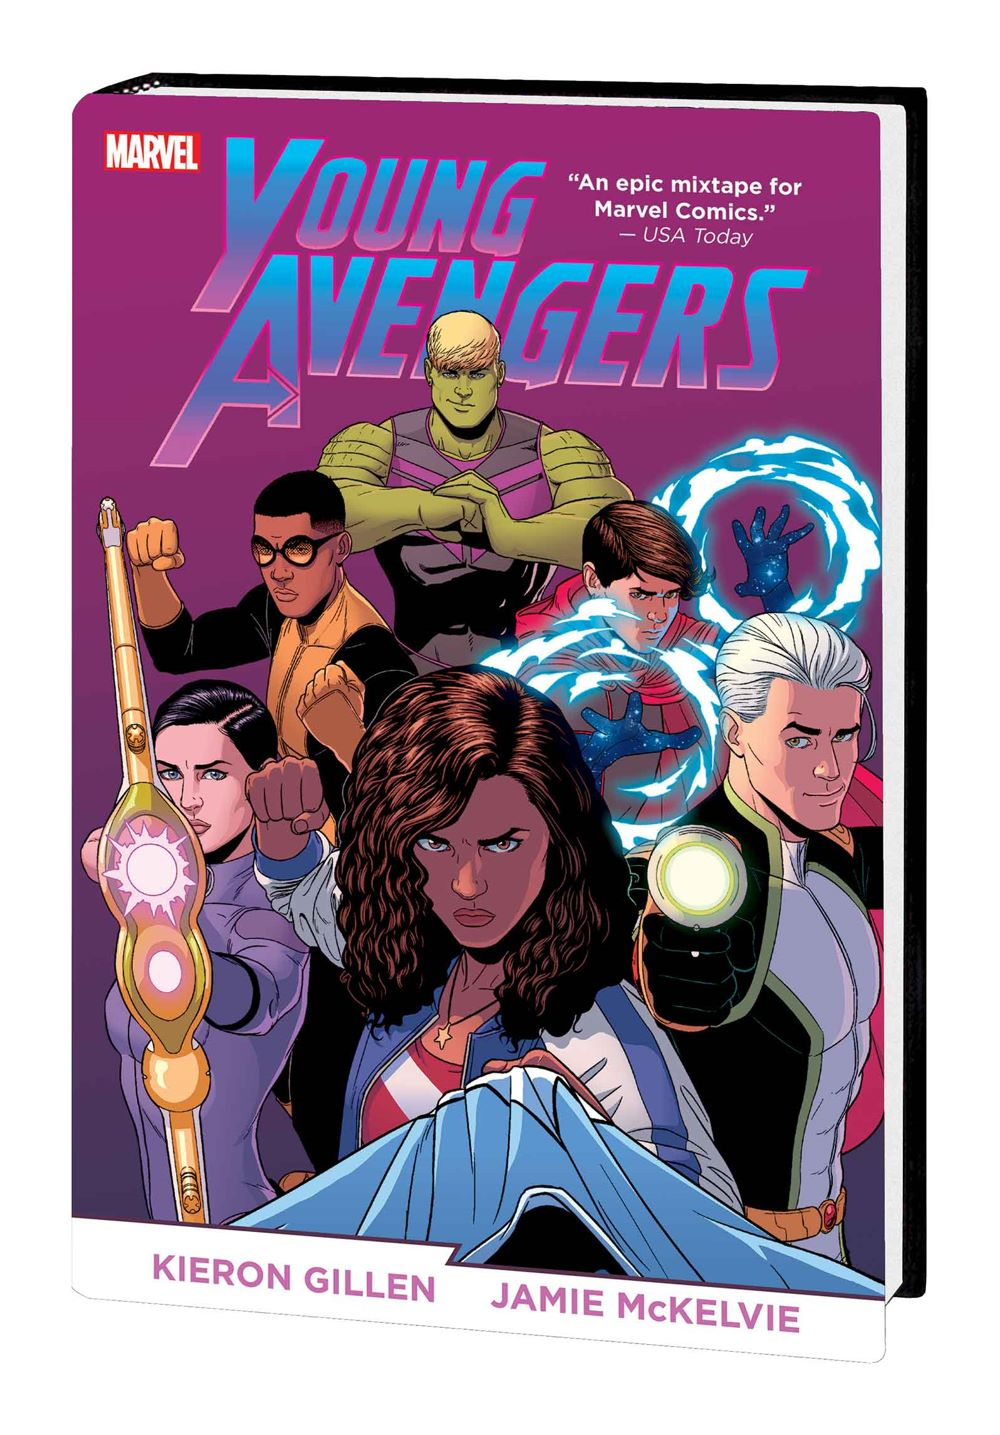 YNGAVNKGJMOMNI_HC Marvel Comics June 2021 Solicitations